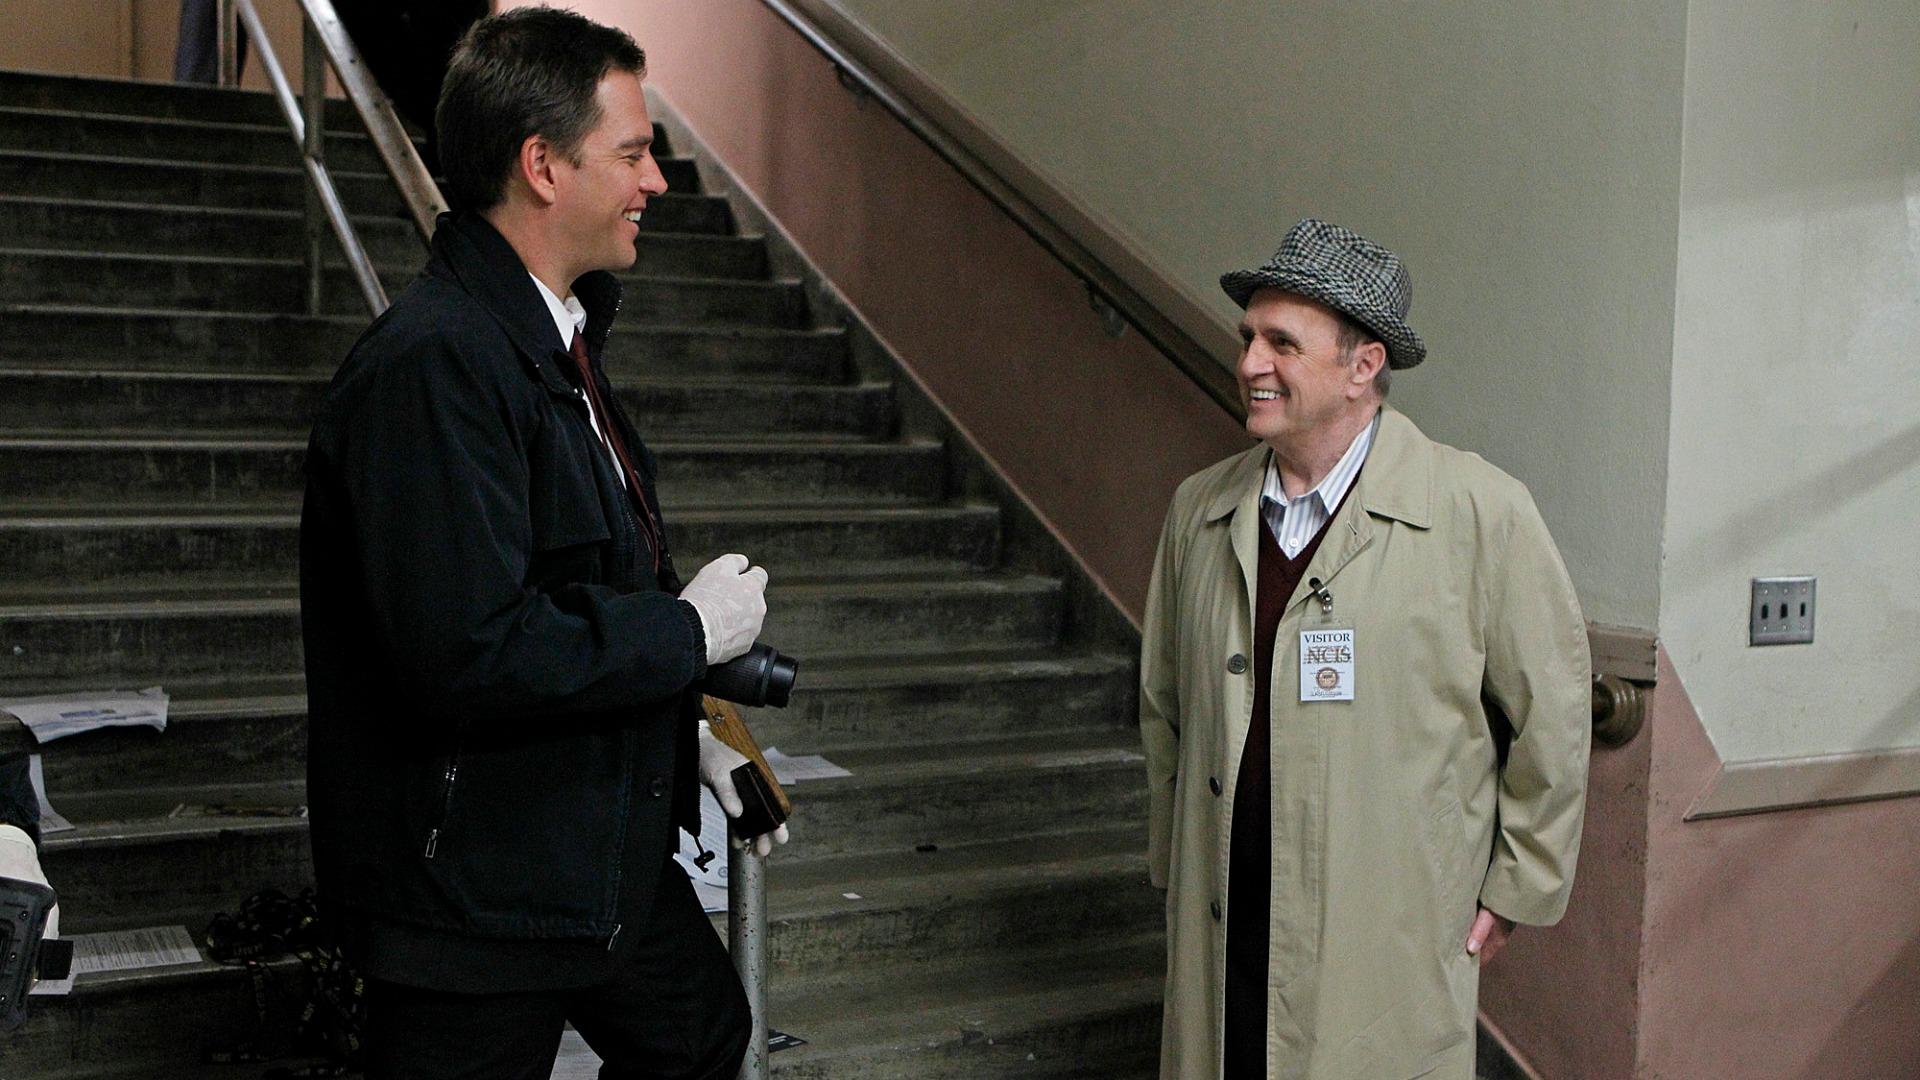 Bob Newhart as Dr. Walter Magnus